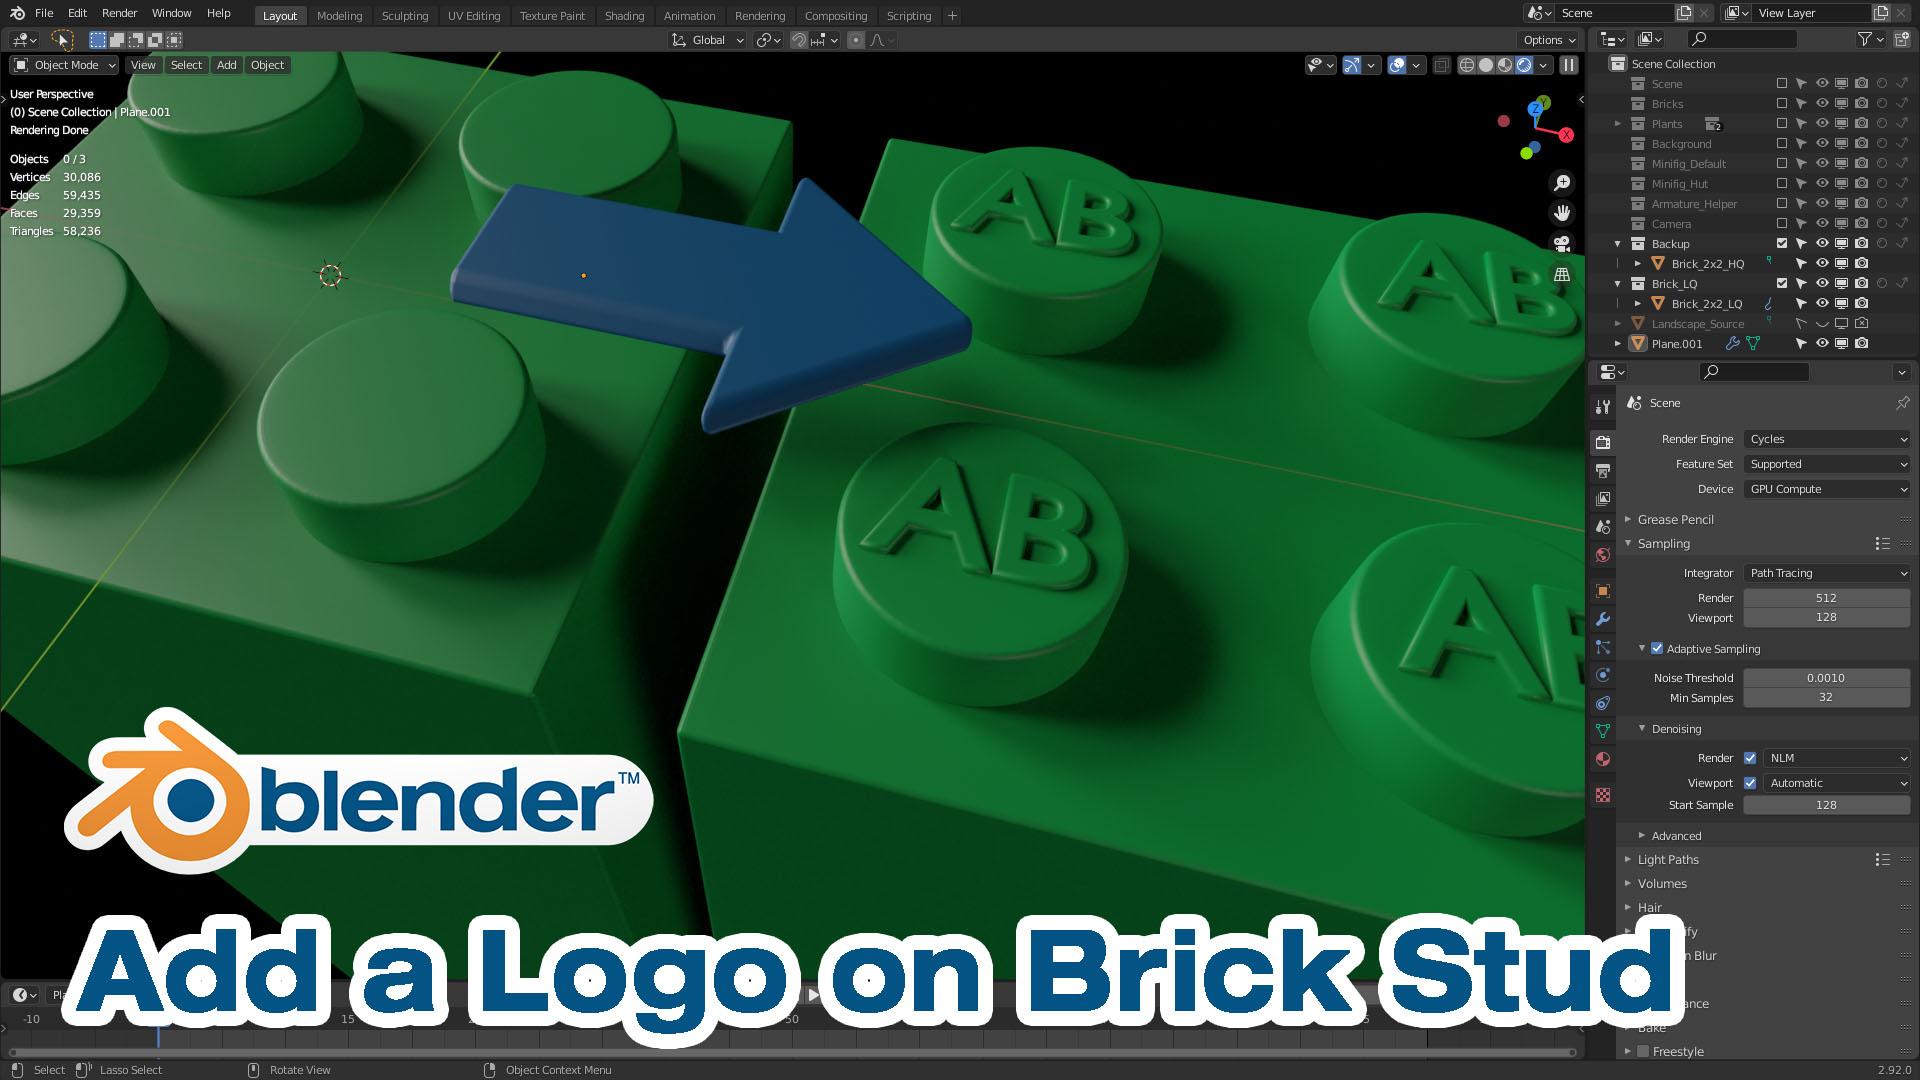 https://brickshelf.com/gallery/Peiler/Making-Of/13_logo_text.jpg